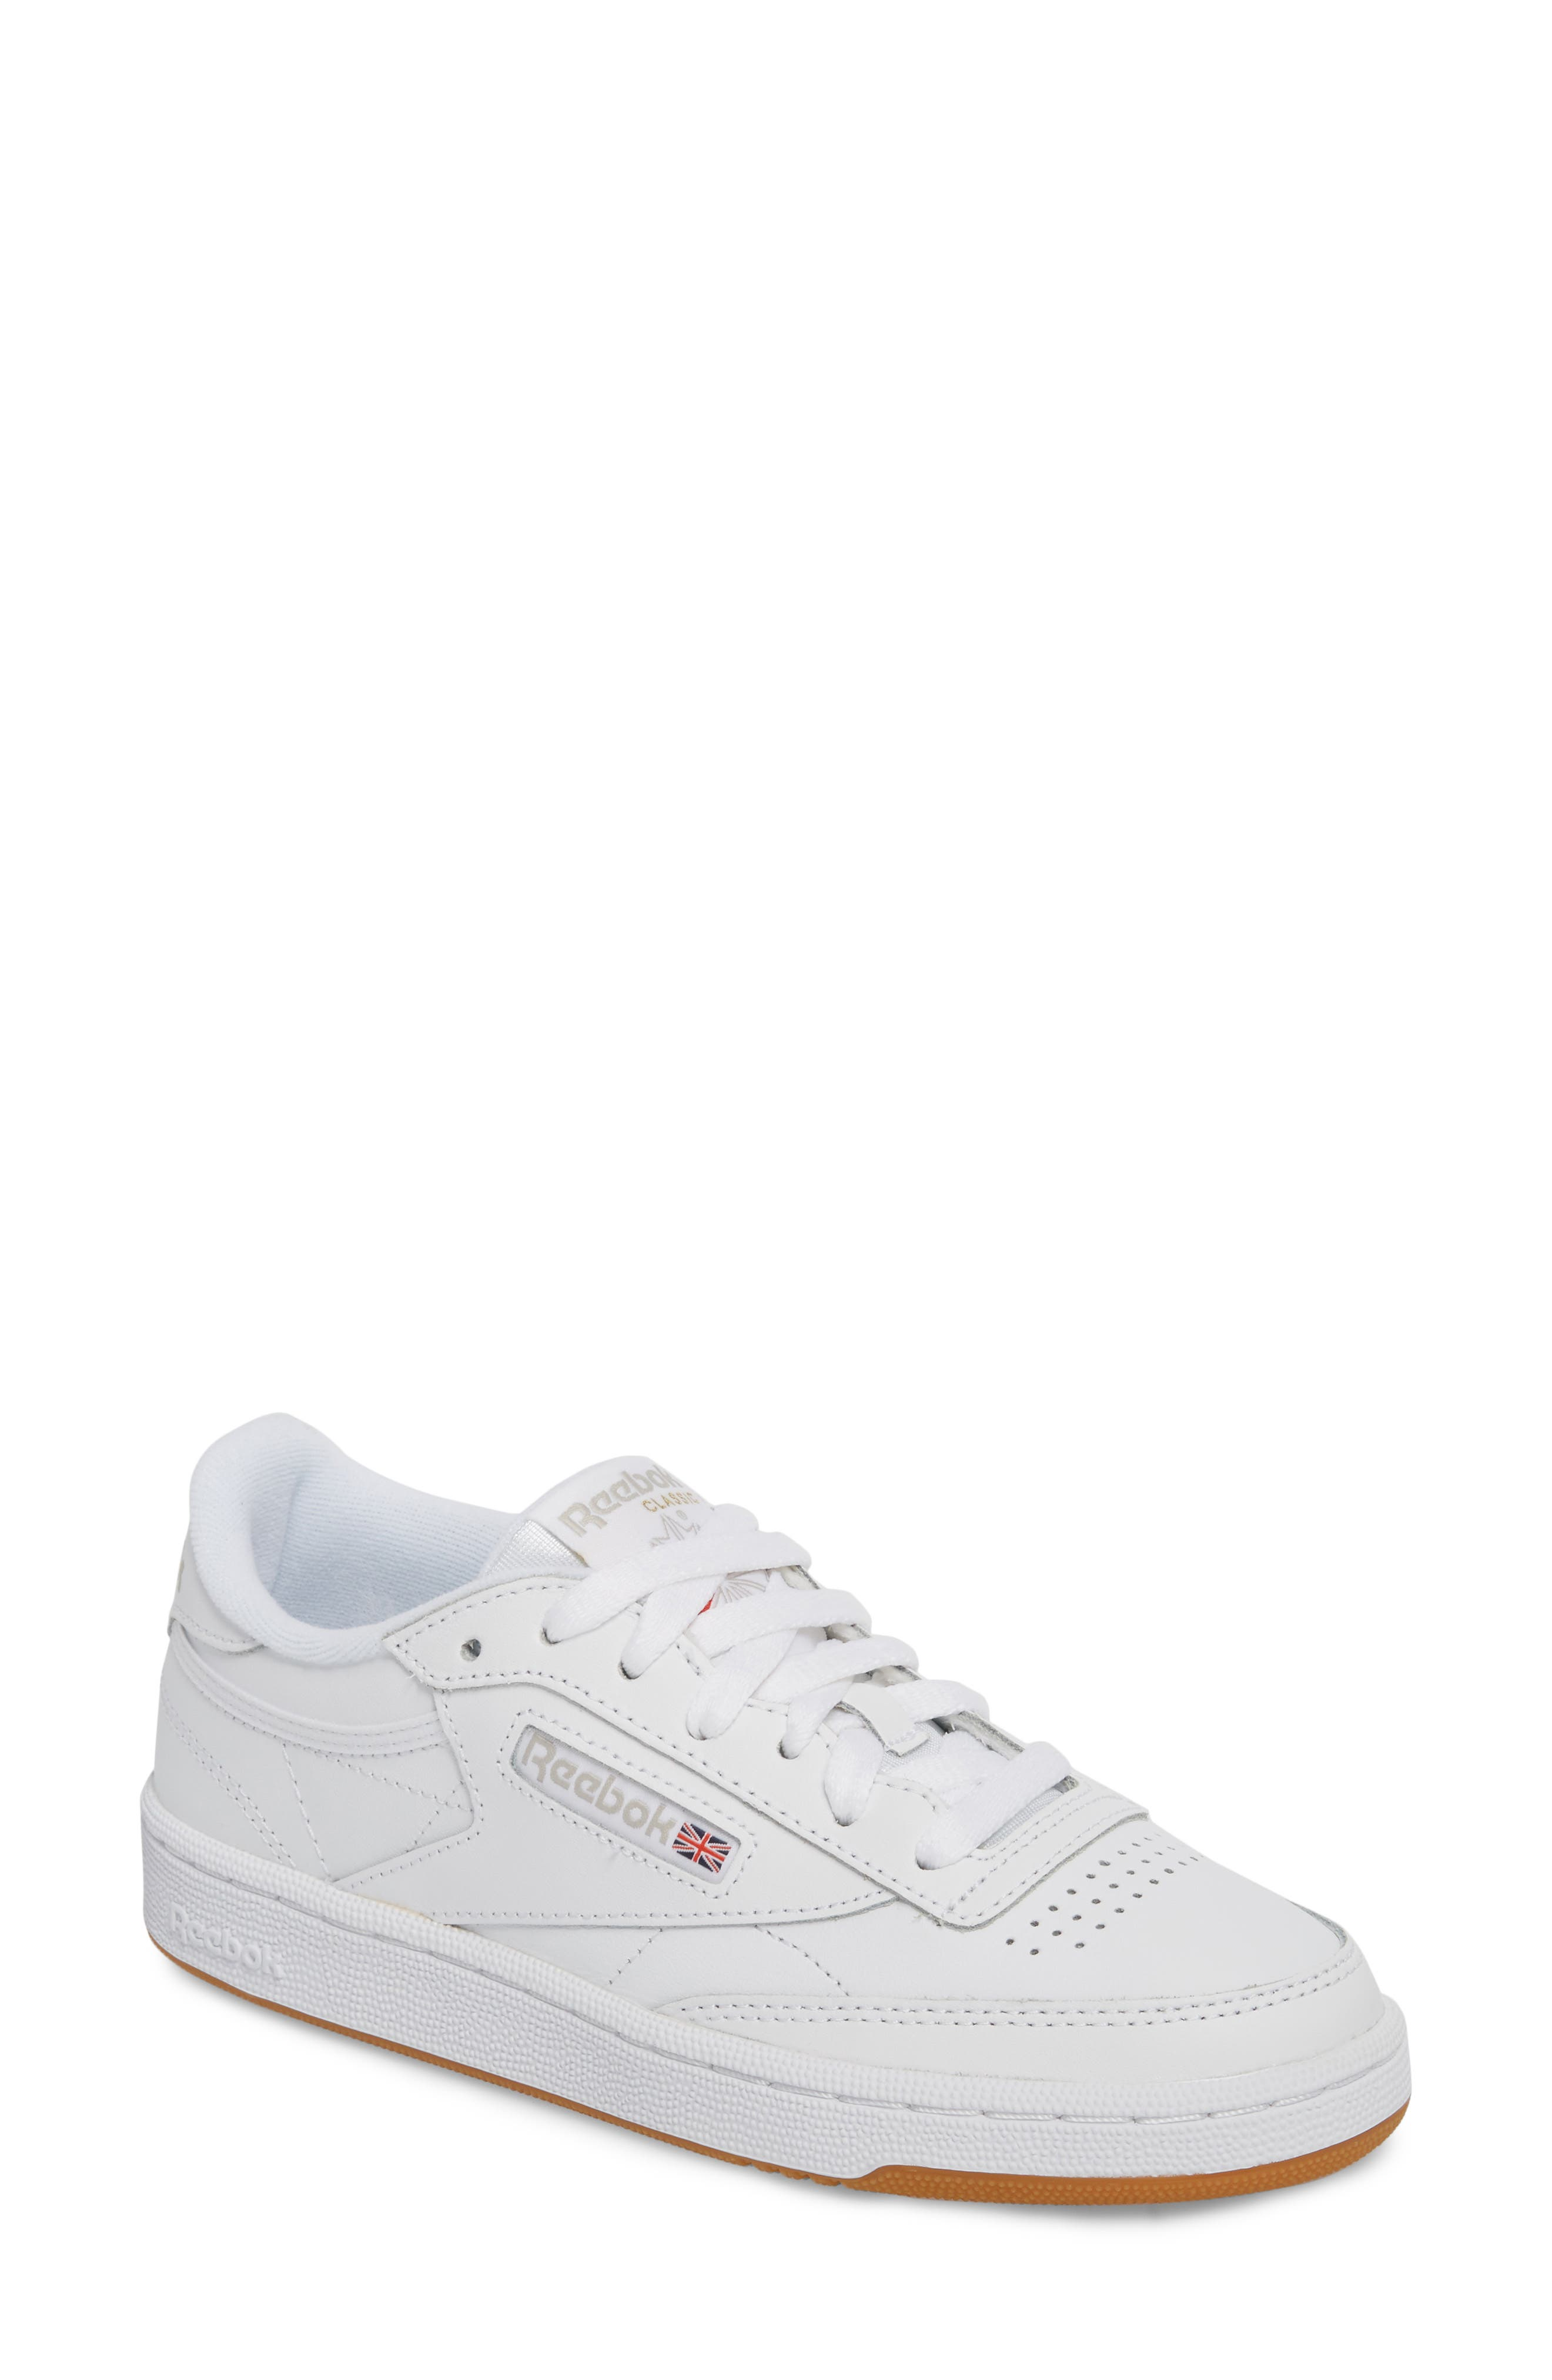 REEBOK, Club C 85 Sneaker, Main thumbnail 1, color, WHITE/ LIGHT GREY/ GUM